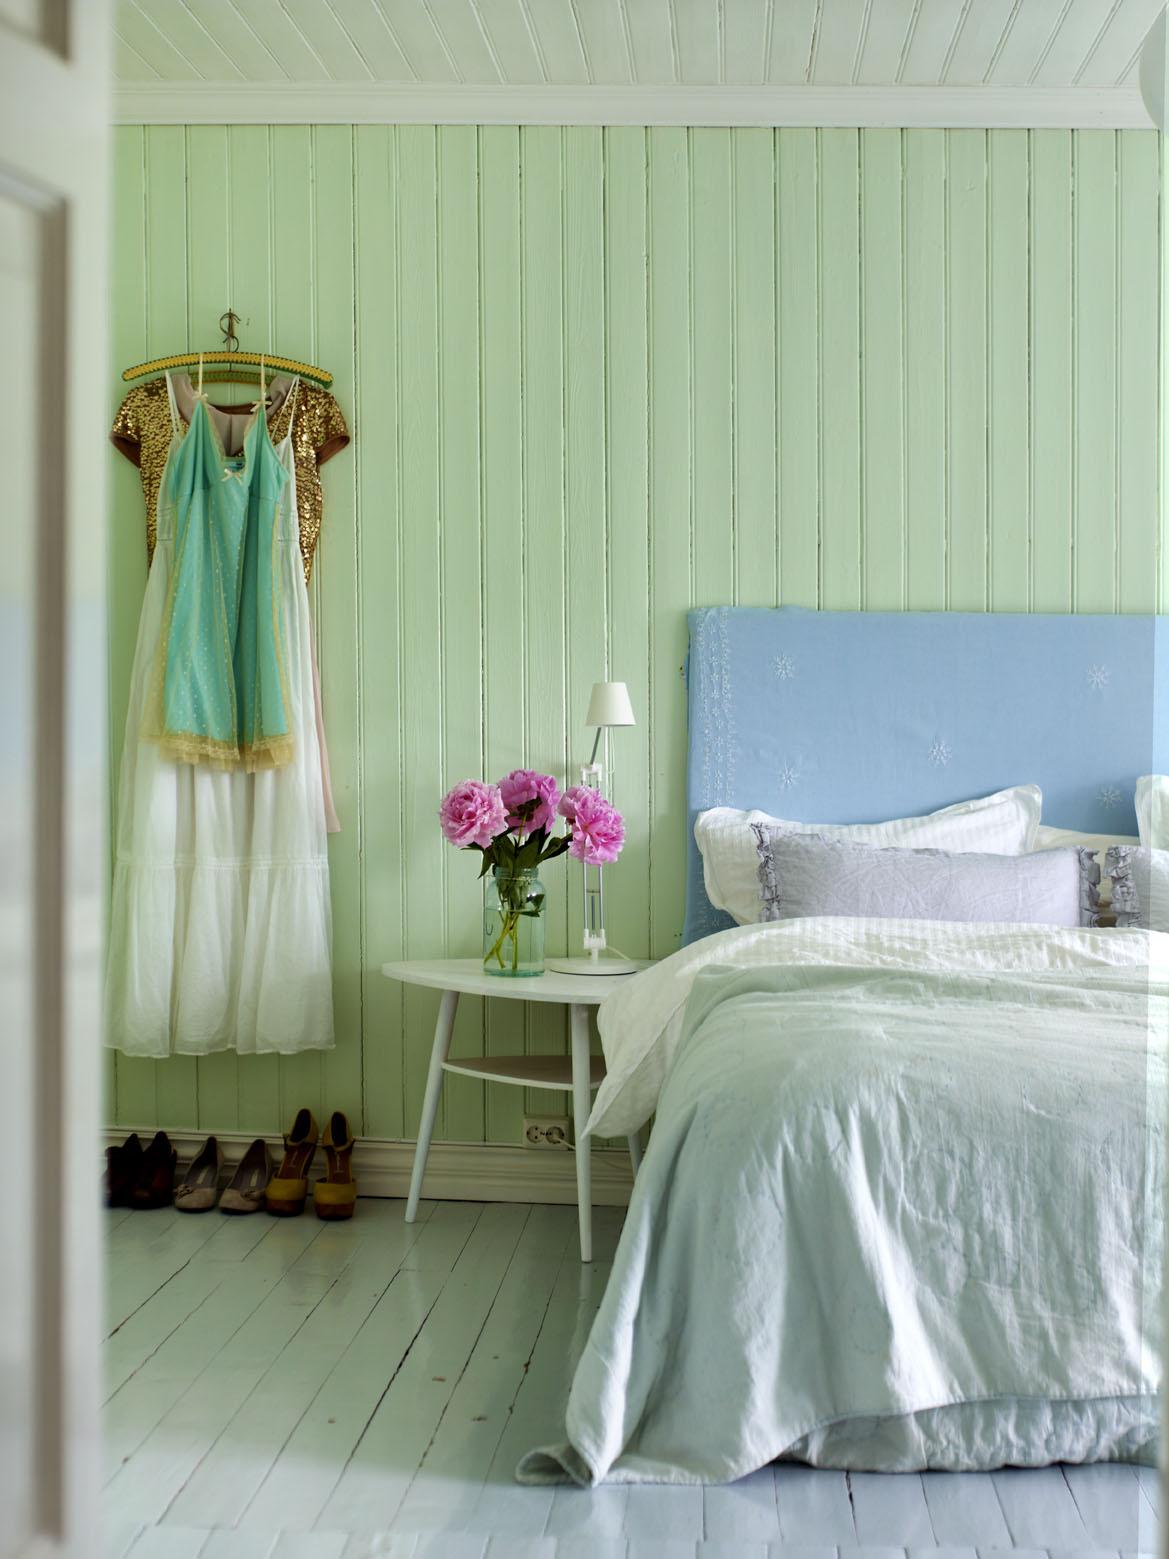 deco chambre lambris peinture verte